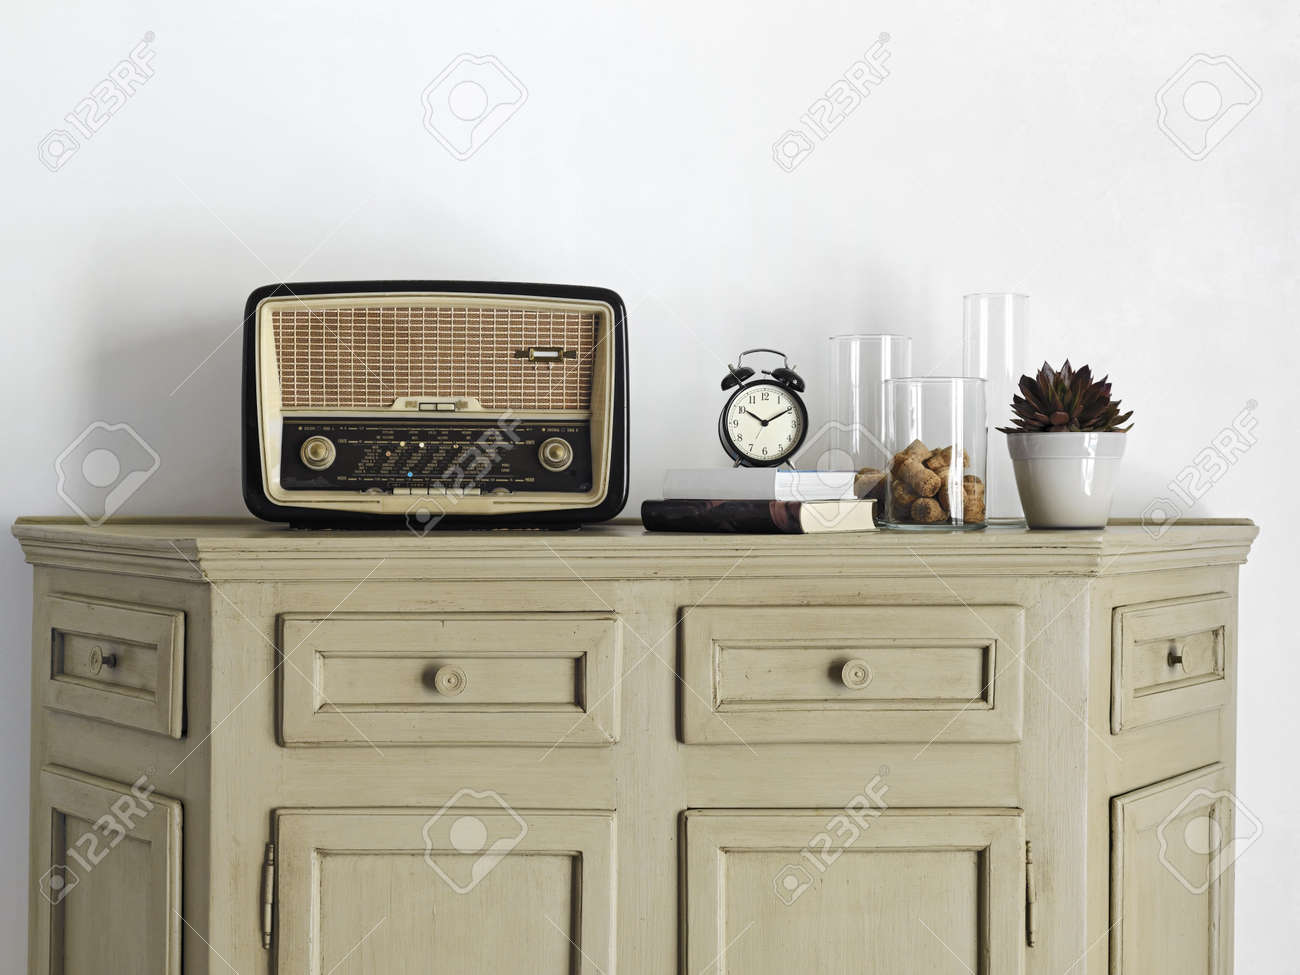 old radio on old furniture Stock Photo - 15601040